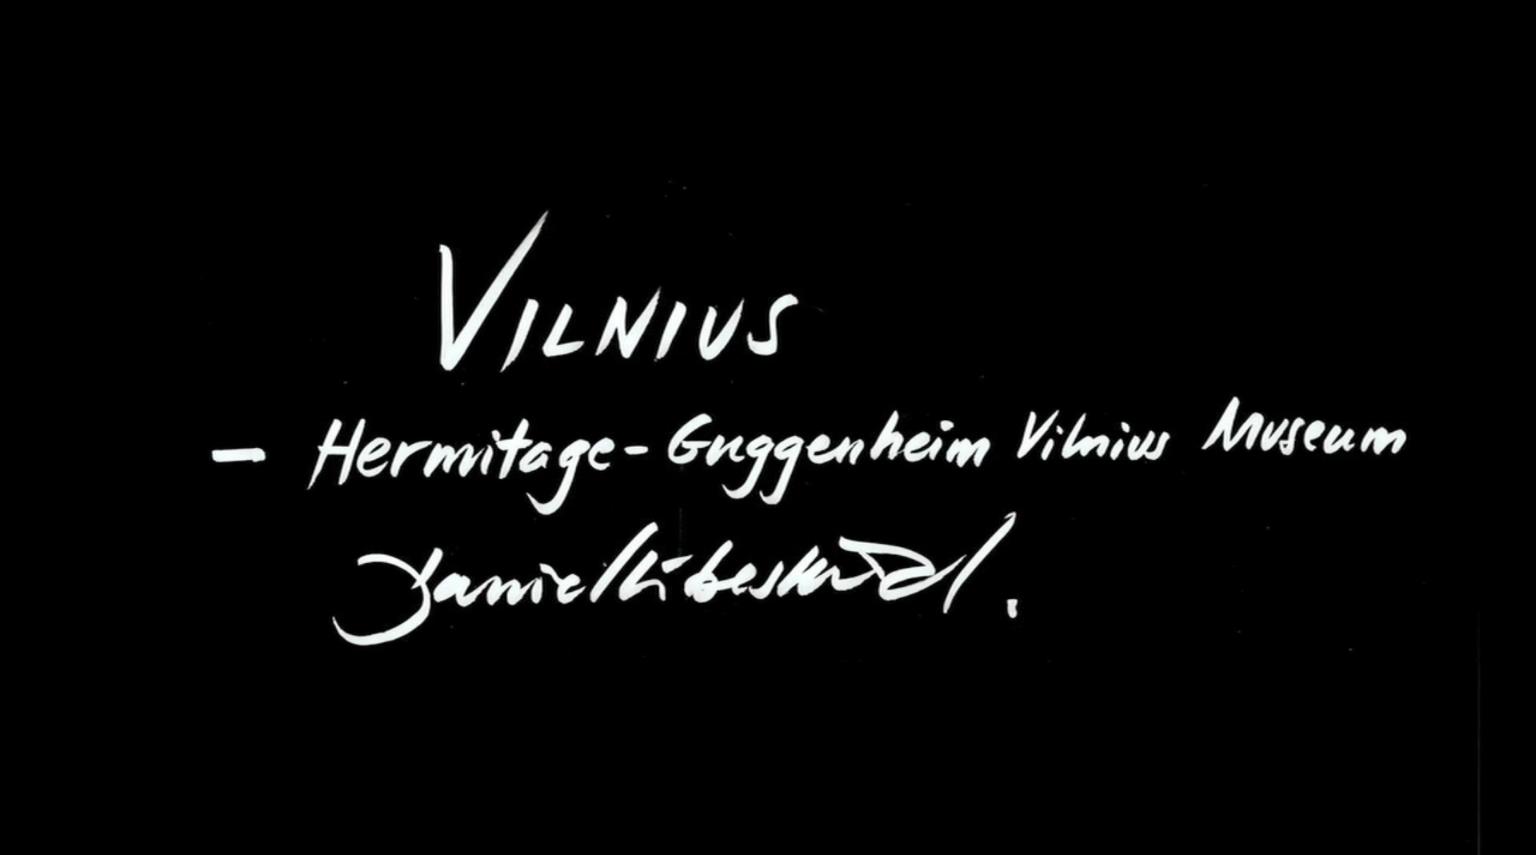 vilnius_thumb.png